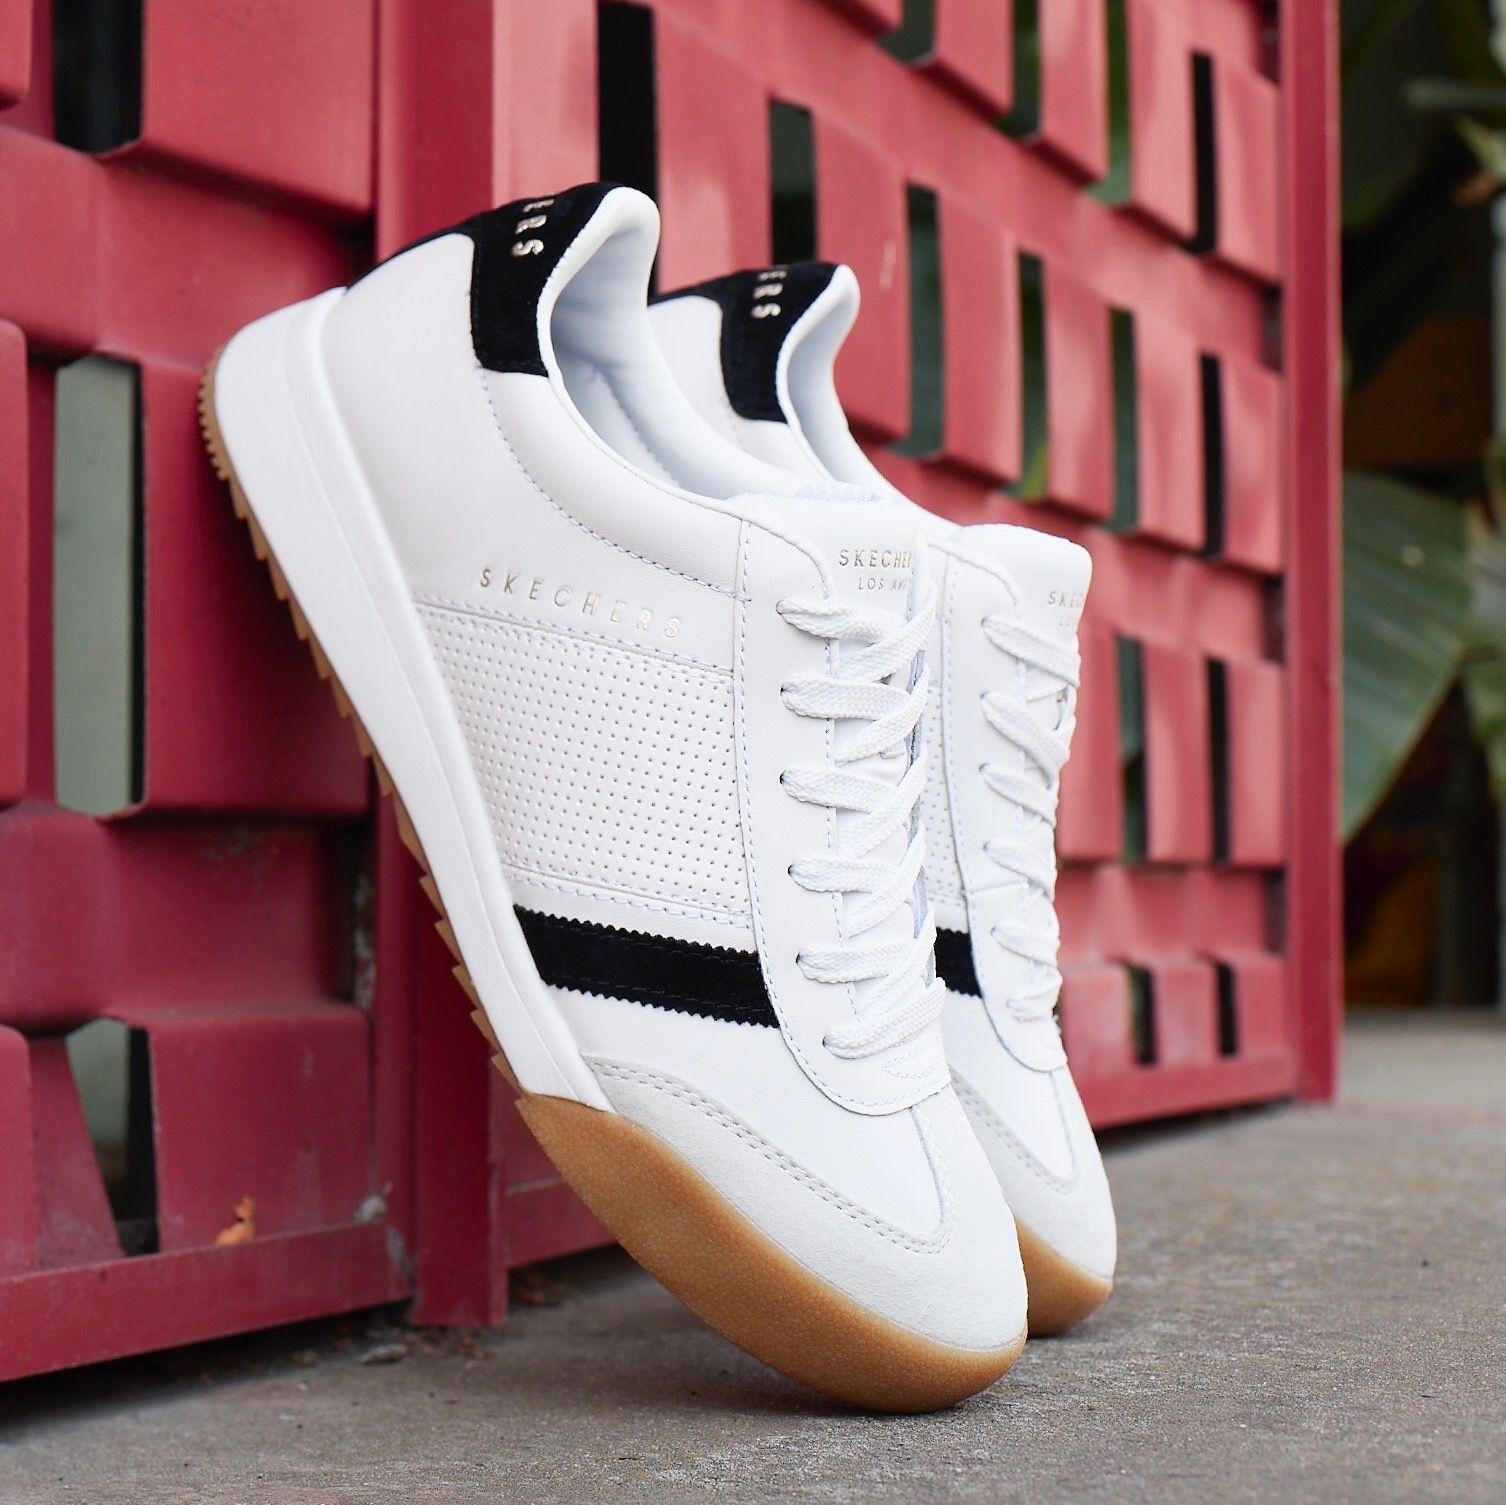 Zinger | For The Fellas in 2019 | Skechers, Sneakers, Smooth